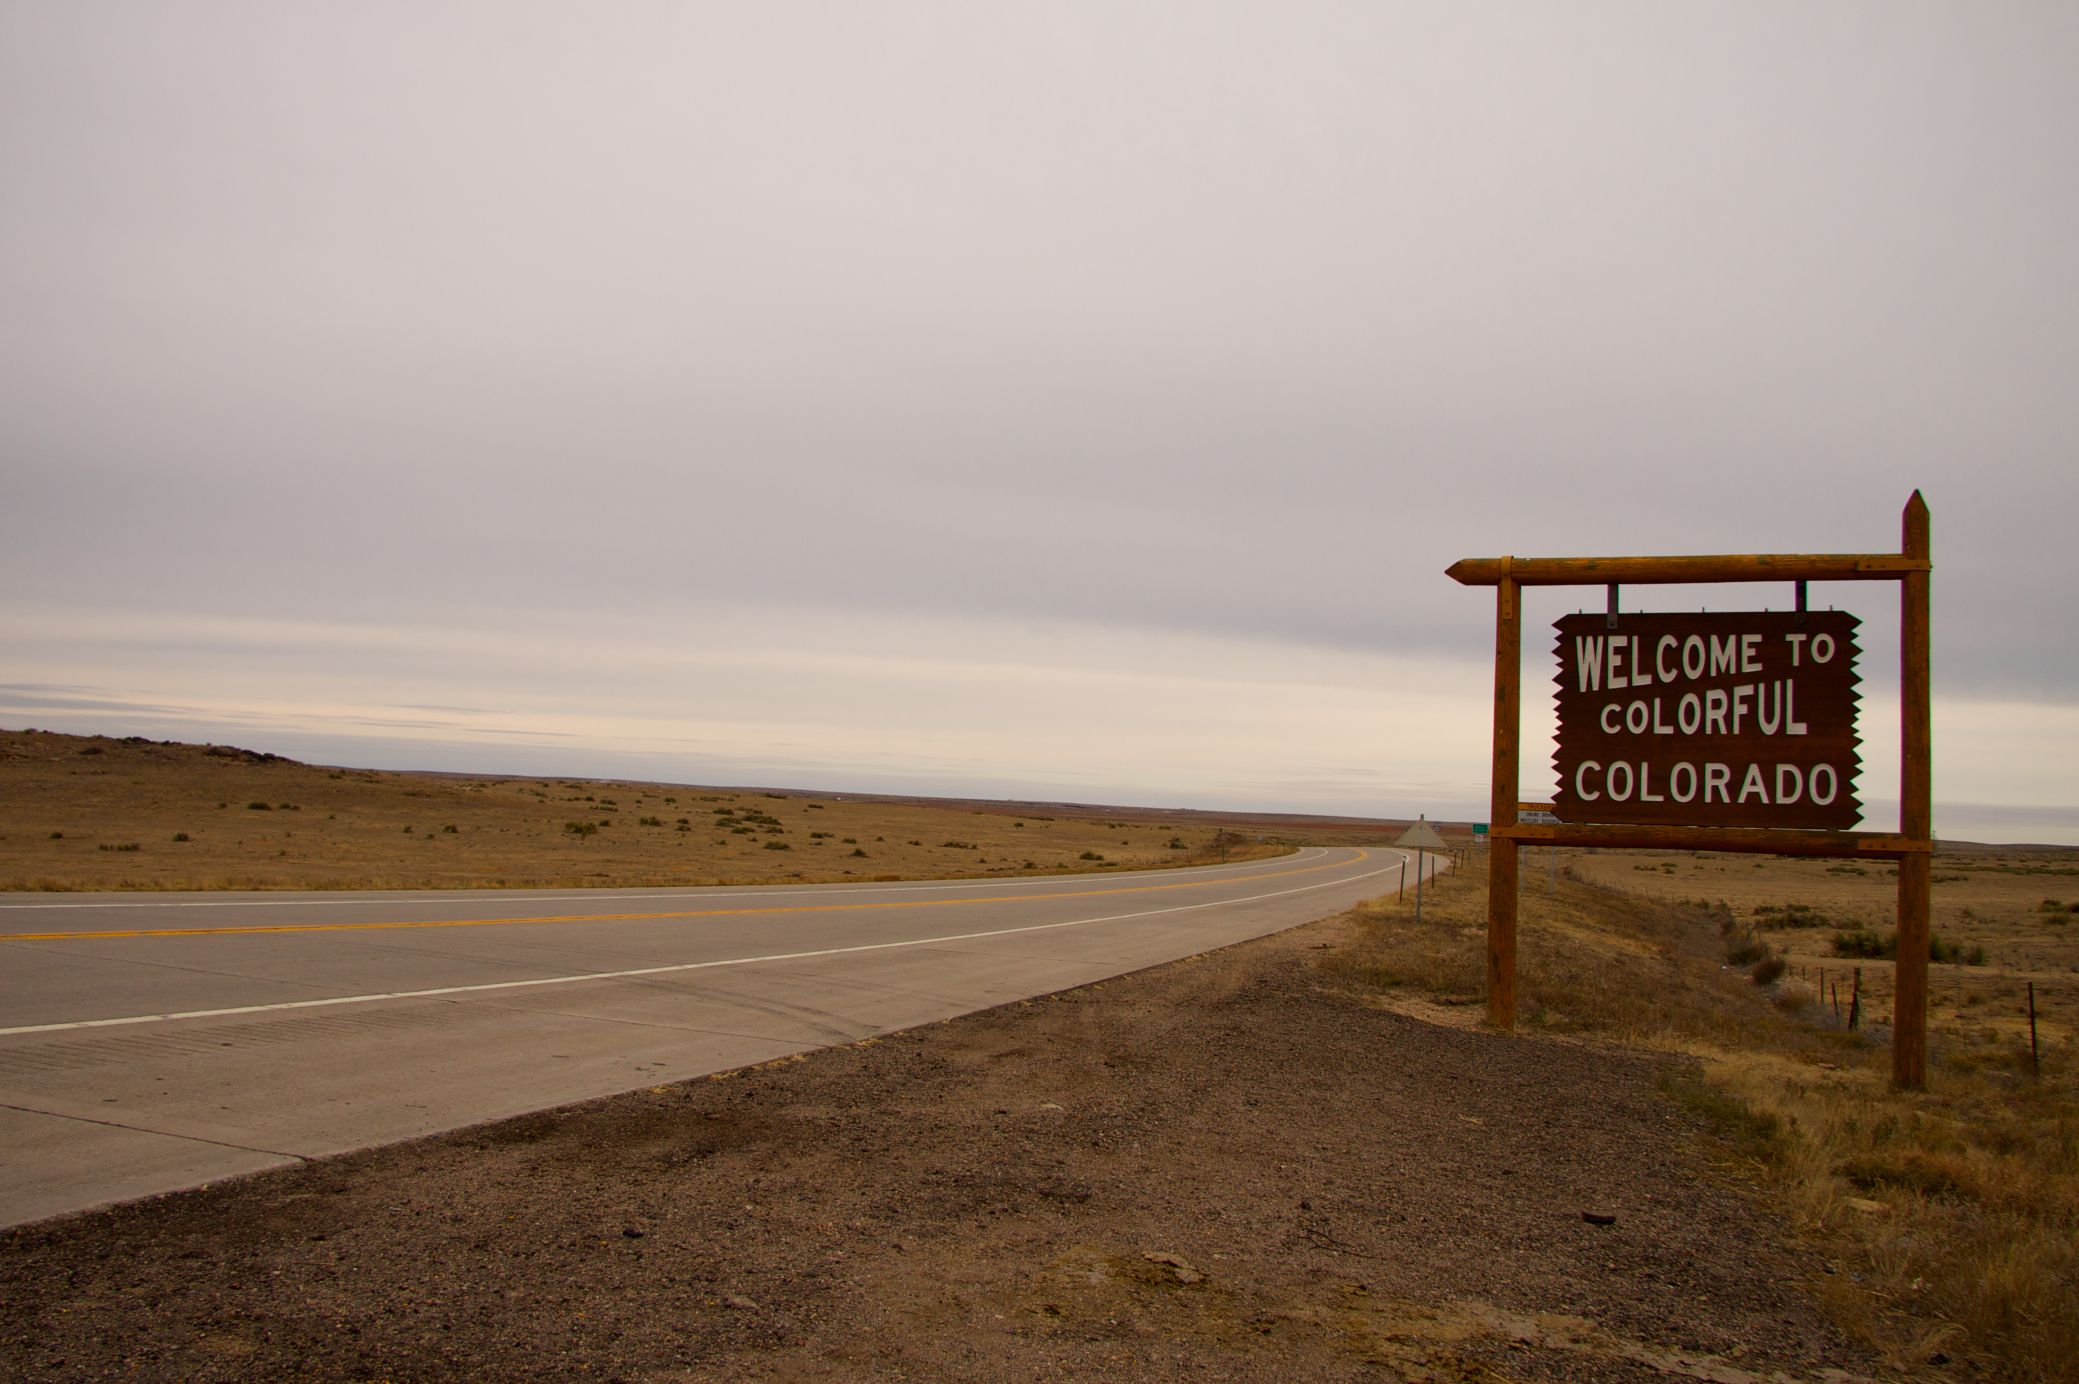 U.S. 287/385, Baca County